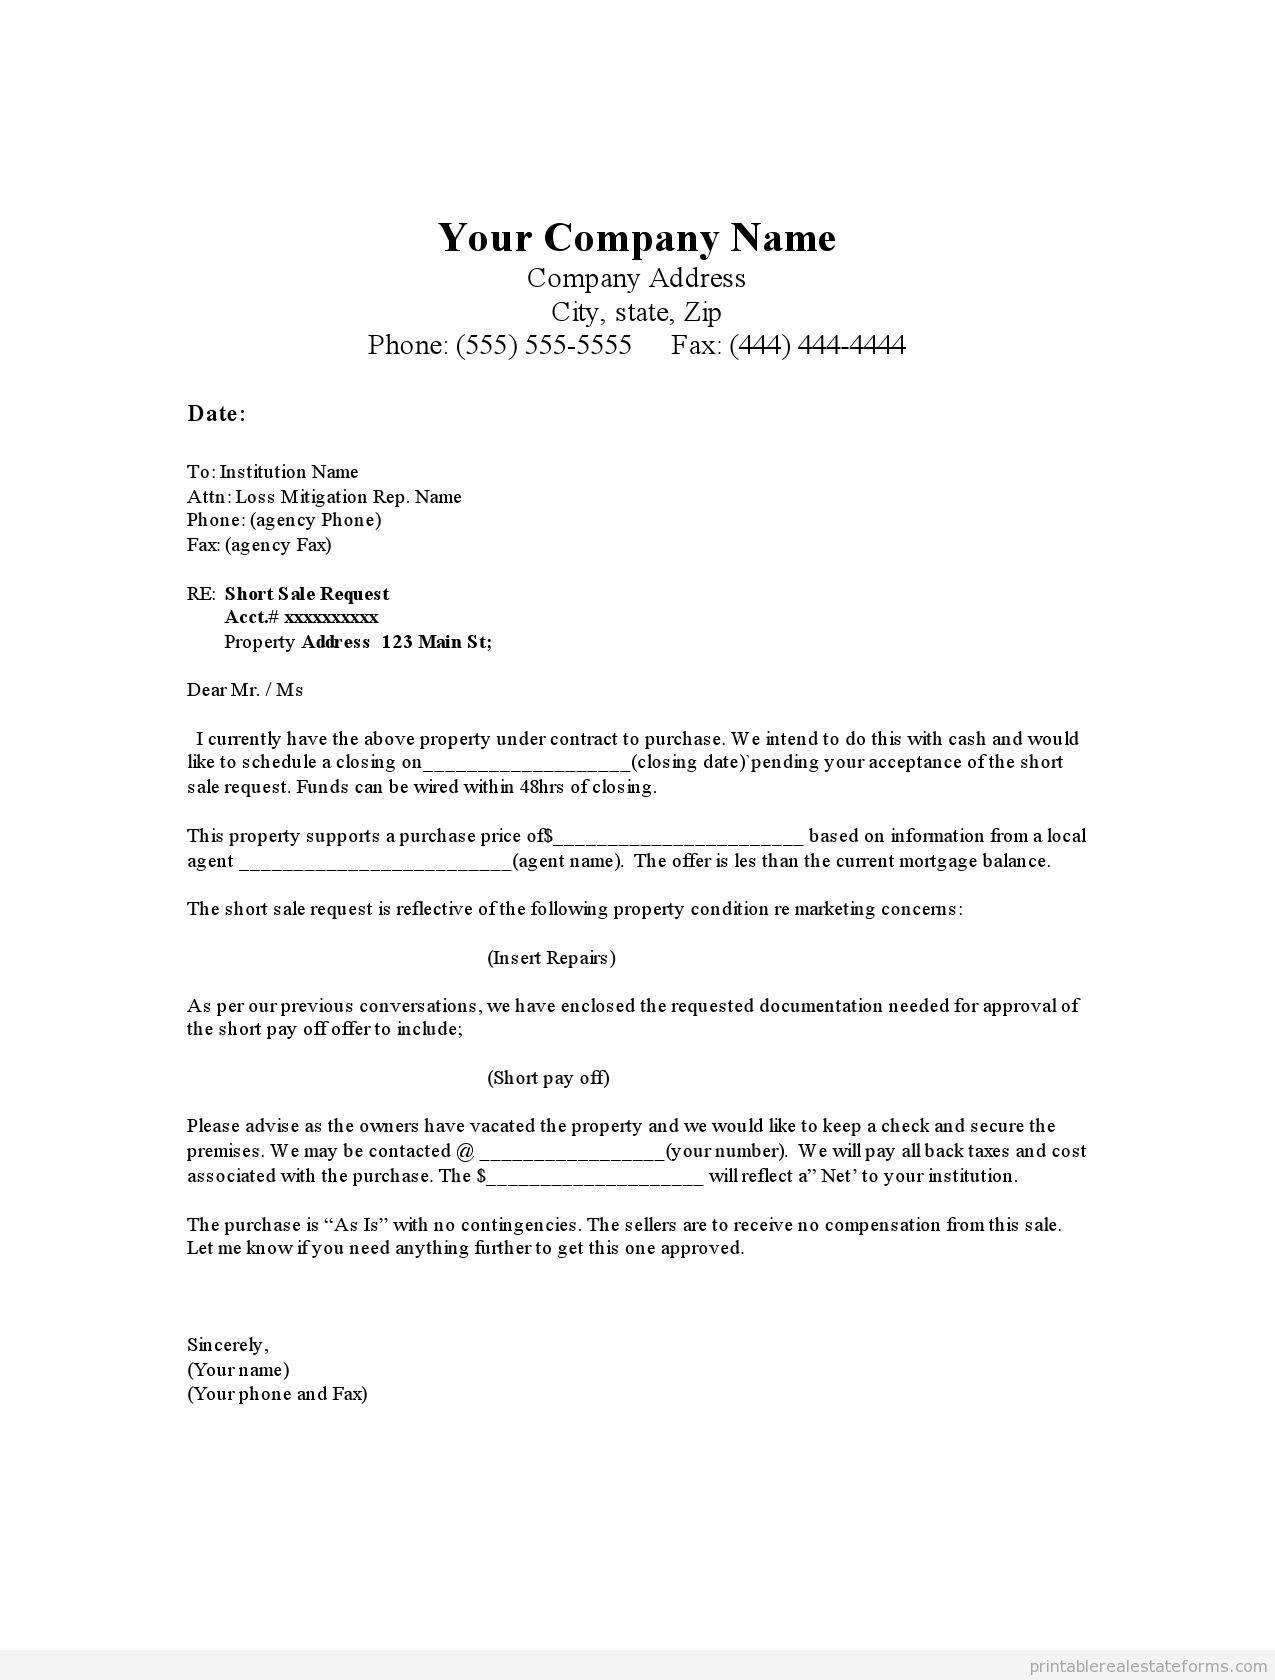 Real Estate Offer Letter Template - Home Fer Letter Template Home Fer Letter Sample Ideas